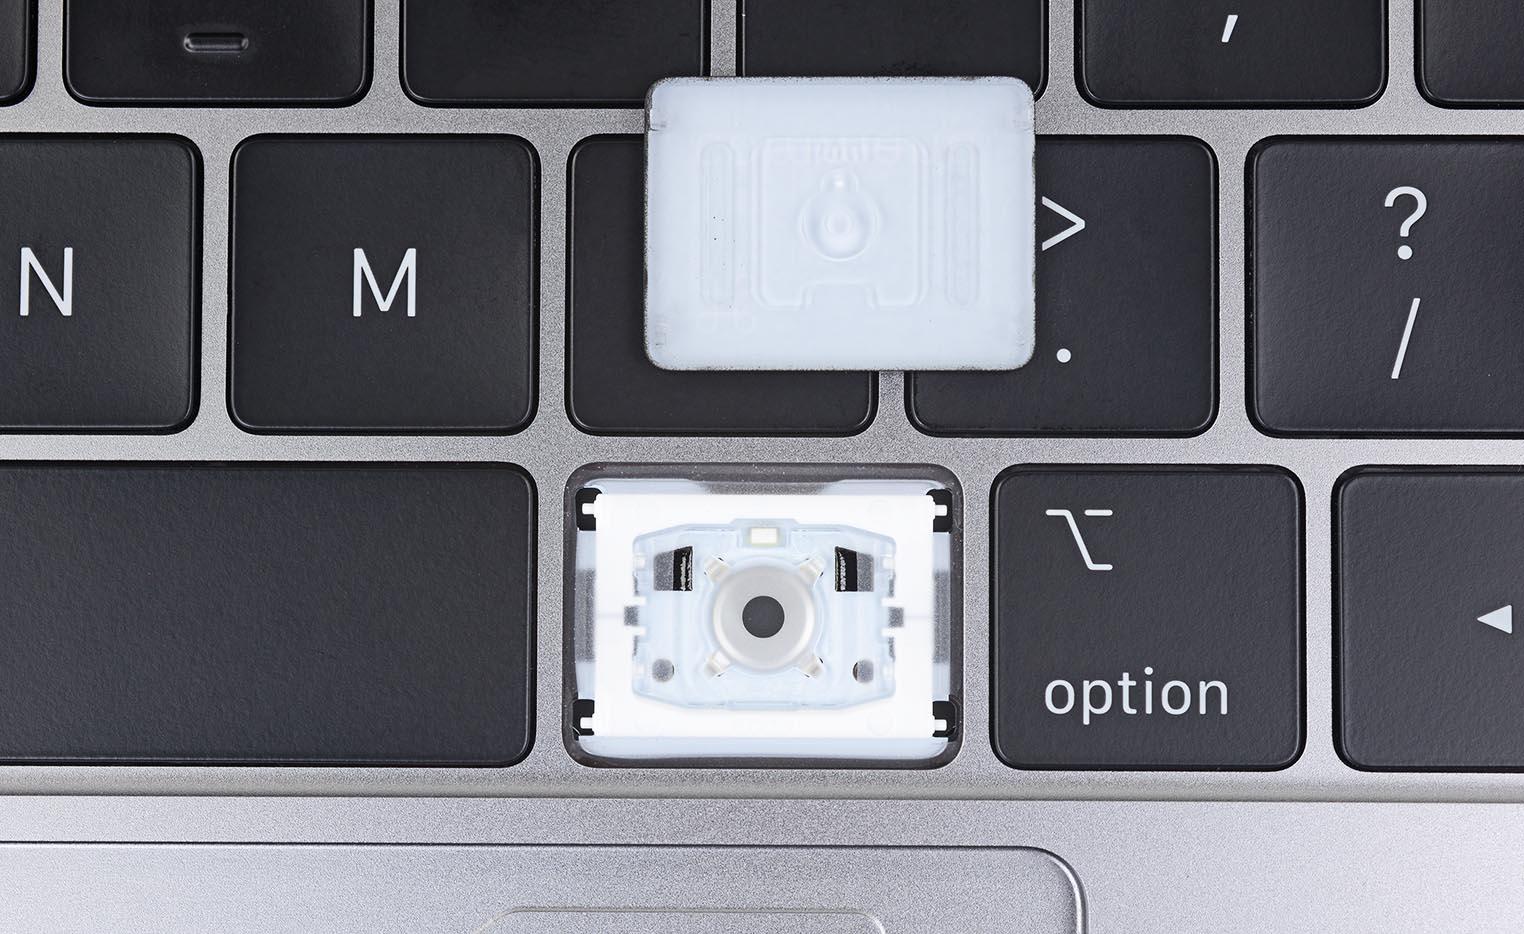 Touche clavier MacBook Pro 2018